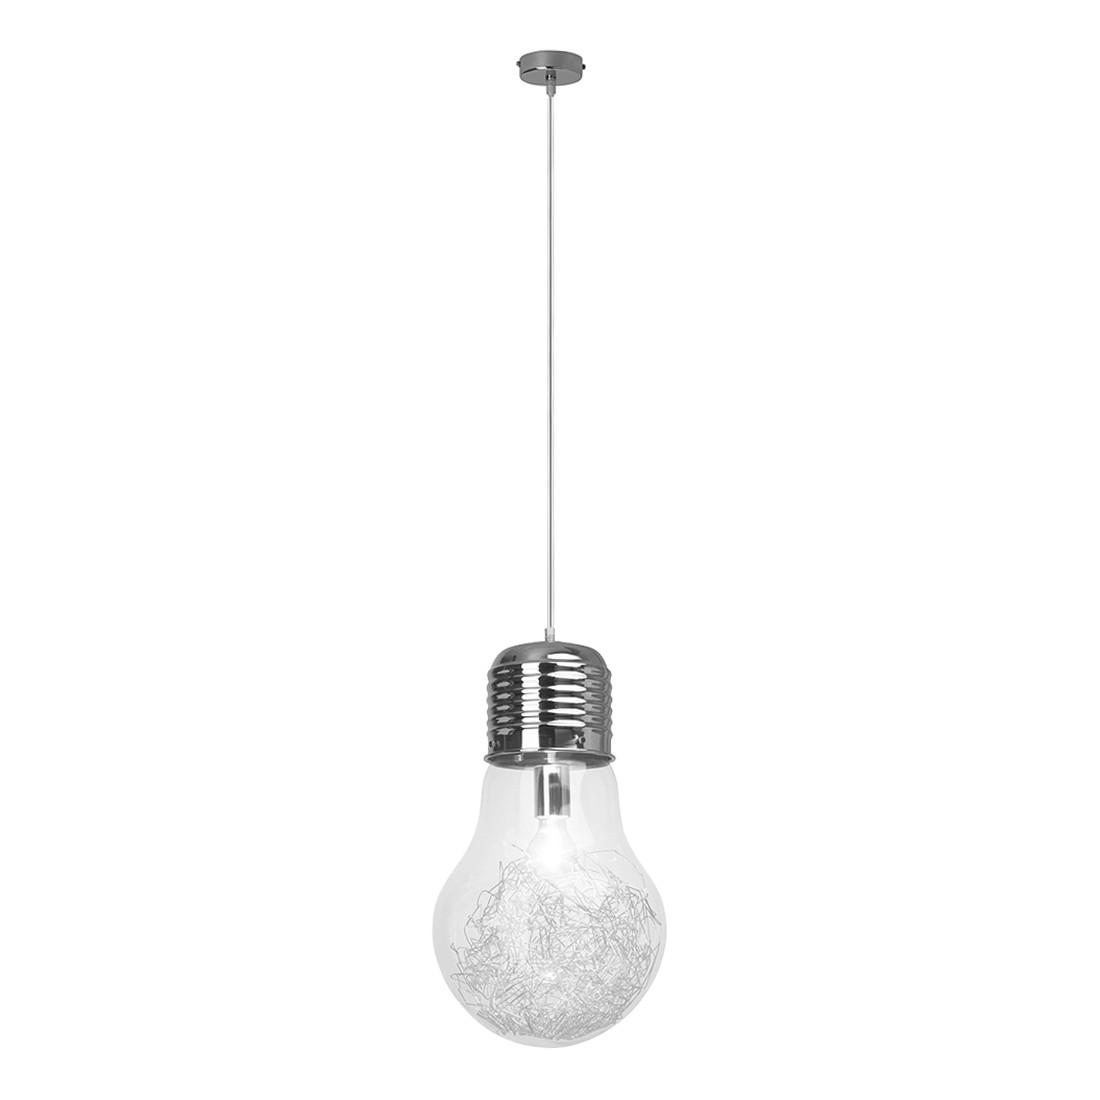 energie A++, Hanglamp Bulb 1 lichtbron, Brilliant